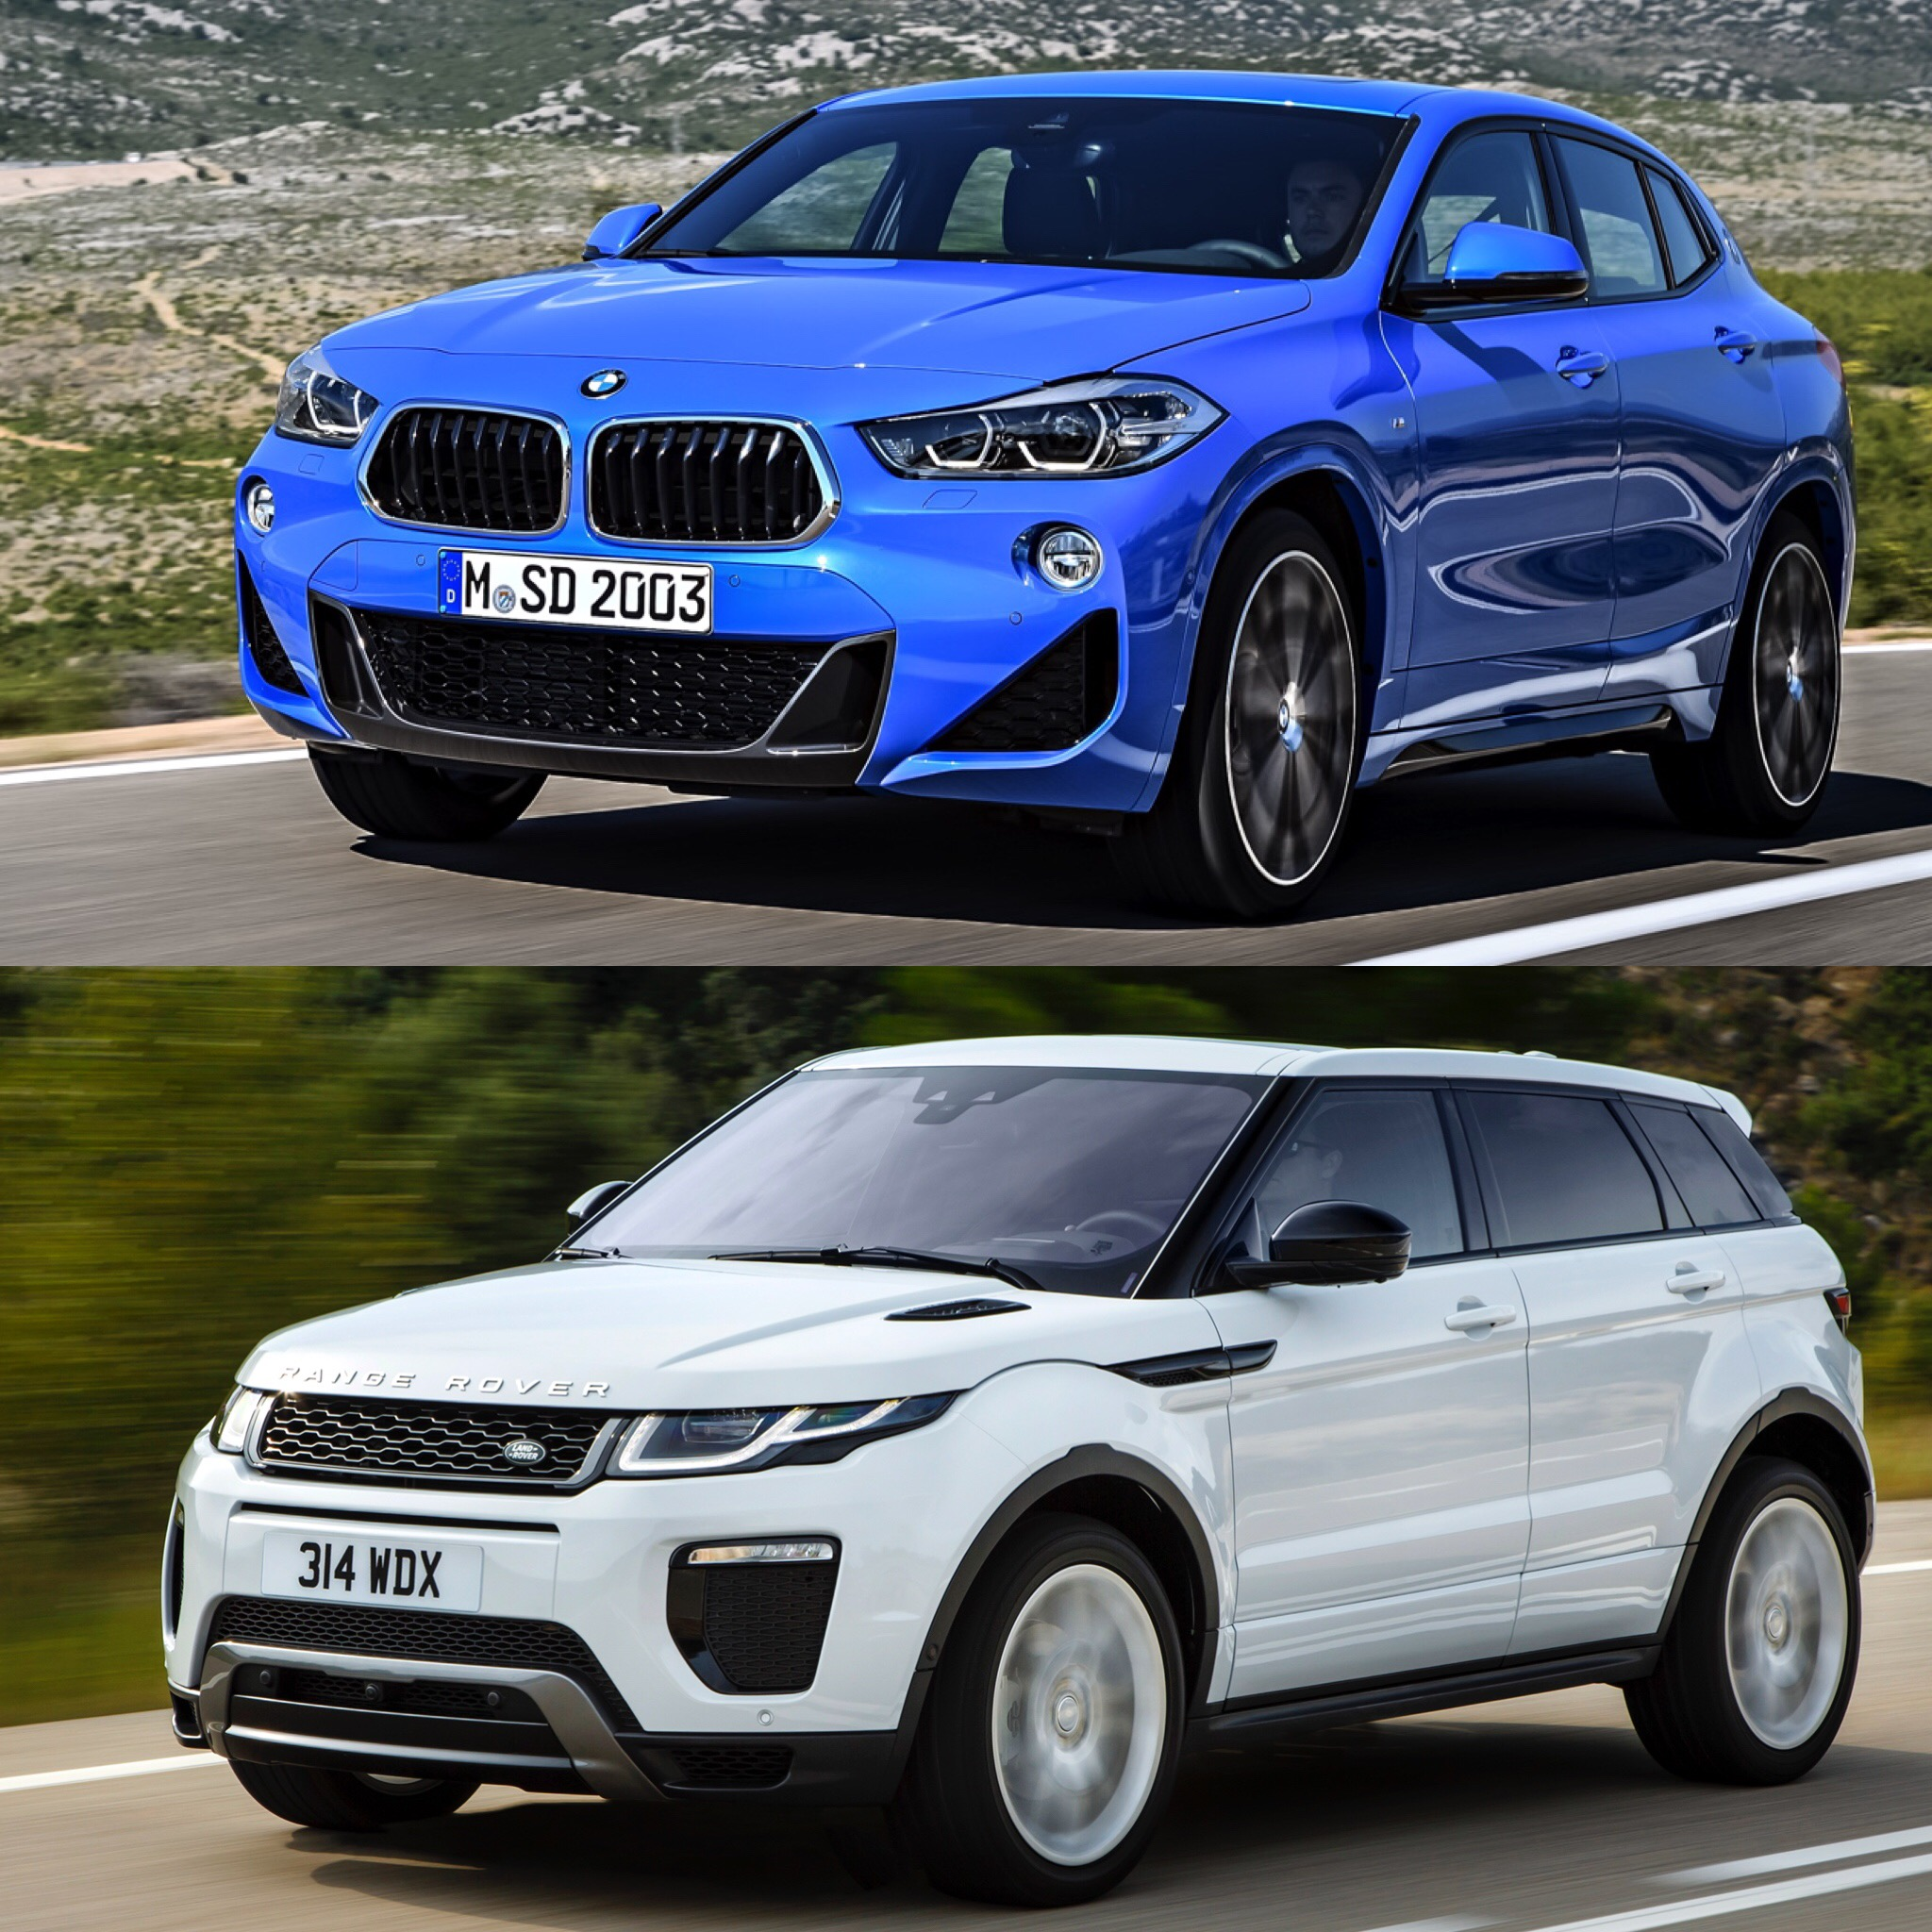 Land Rover Range Rover Evoque: Photo Comparison: BMW X2 Vs Range Rover Evoque